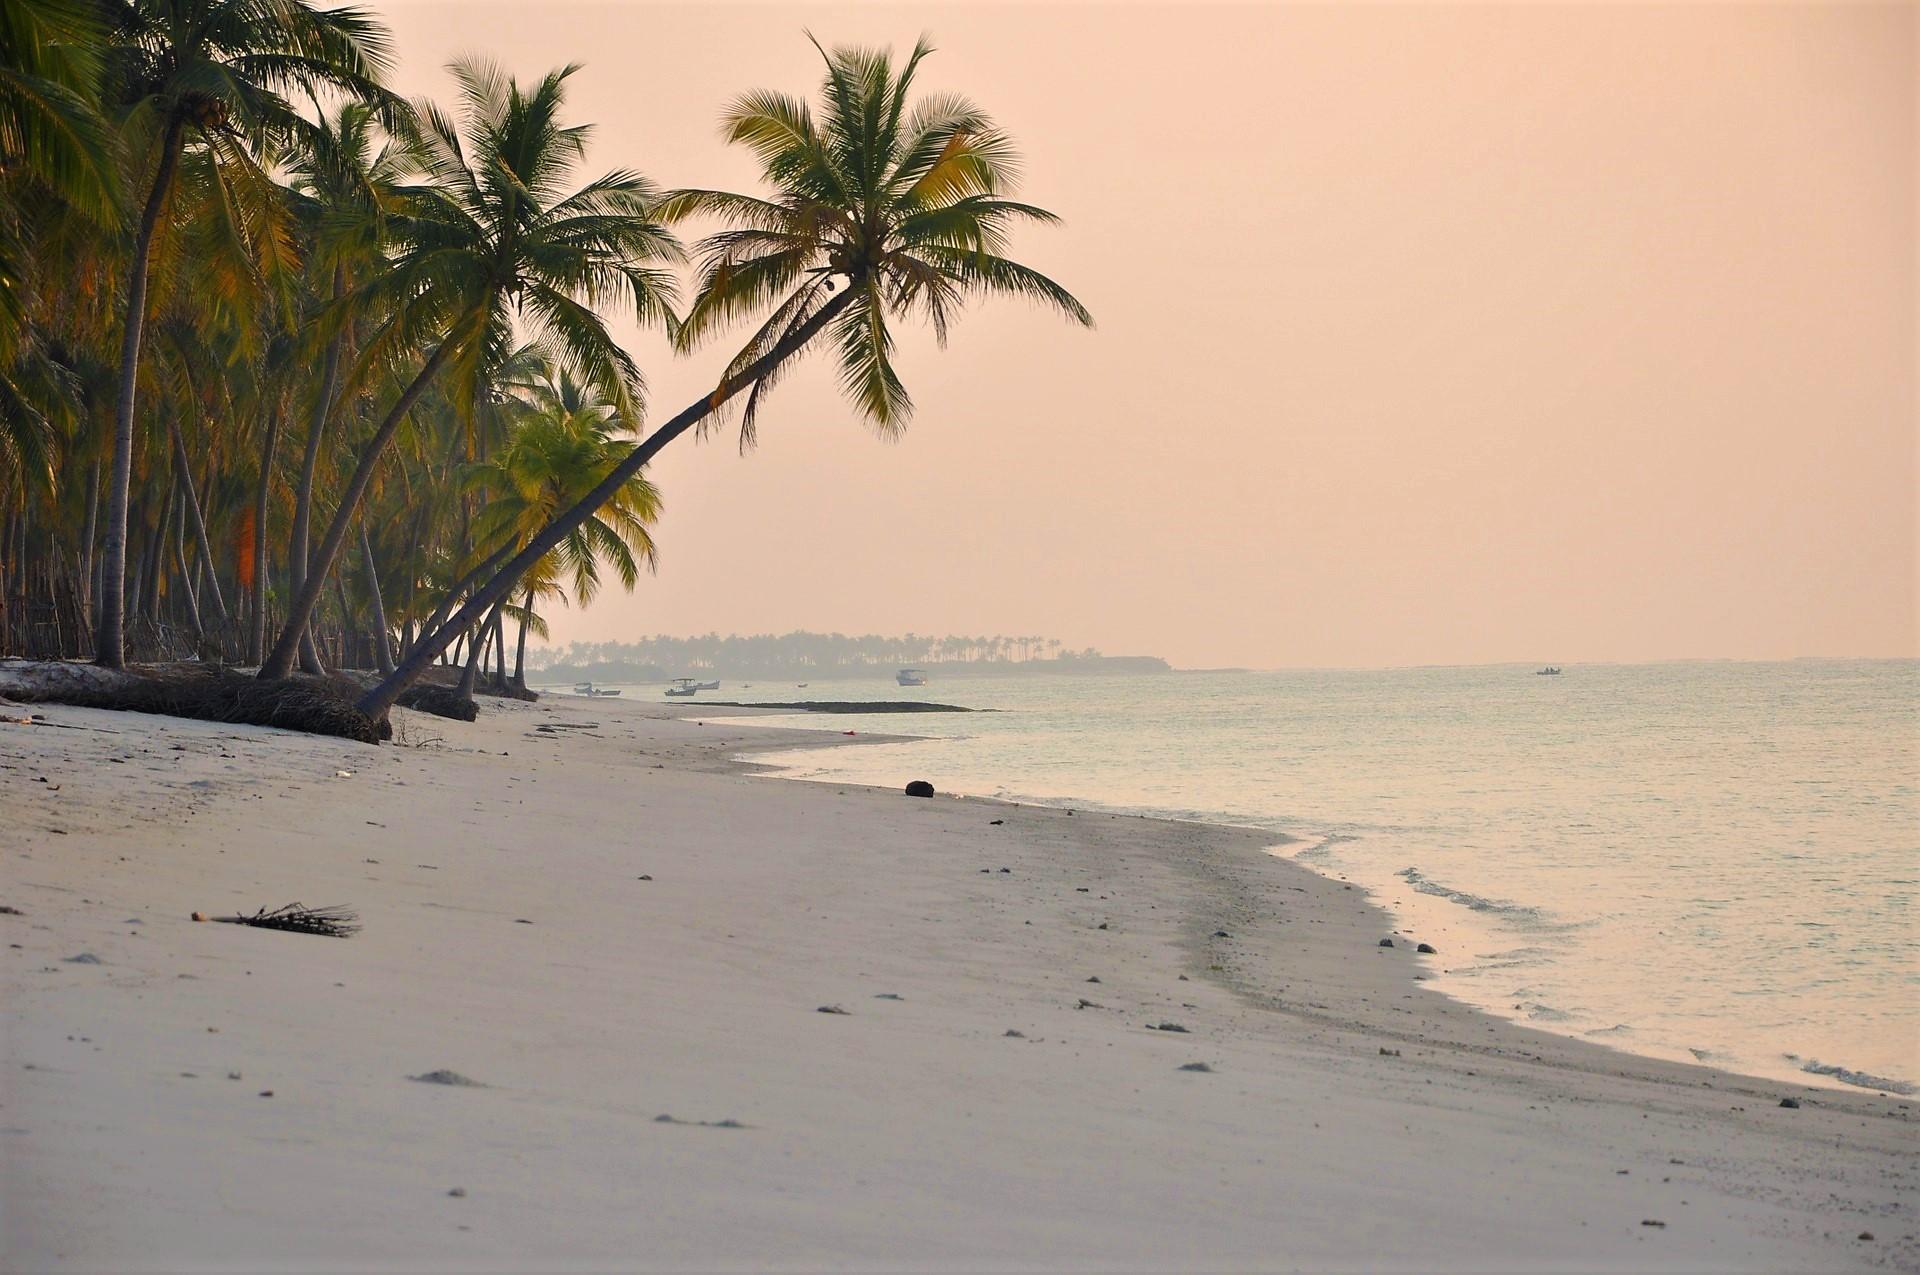 THE CORAL ISLANDS: LAKSHADWEEP